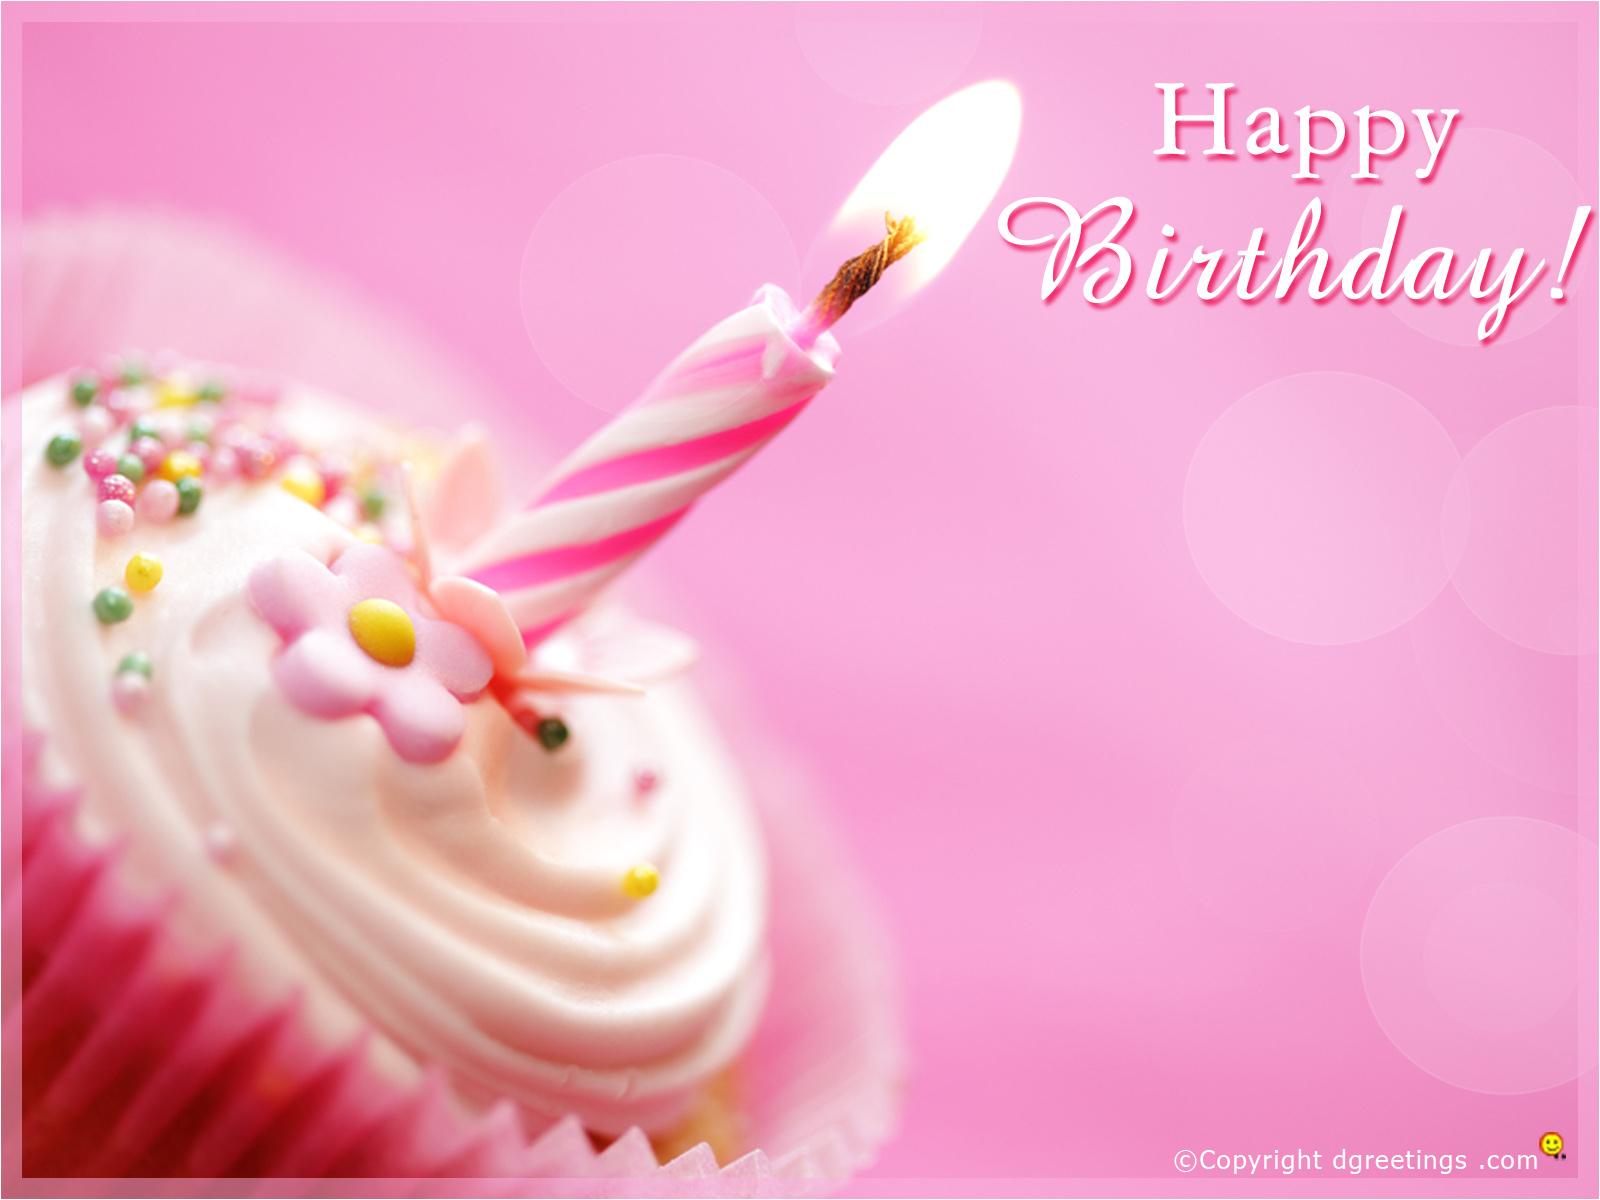 Wallpaper download free image search hd - Wallpaper Download Birthday Birthday Wallpaper Download Wallpaper Download For Mobile Free Hd For